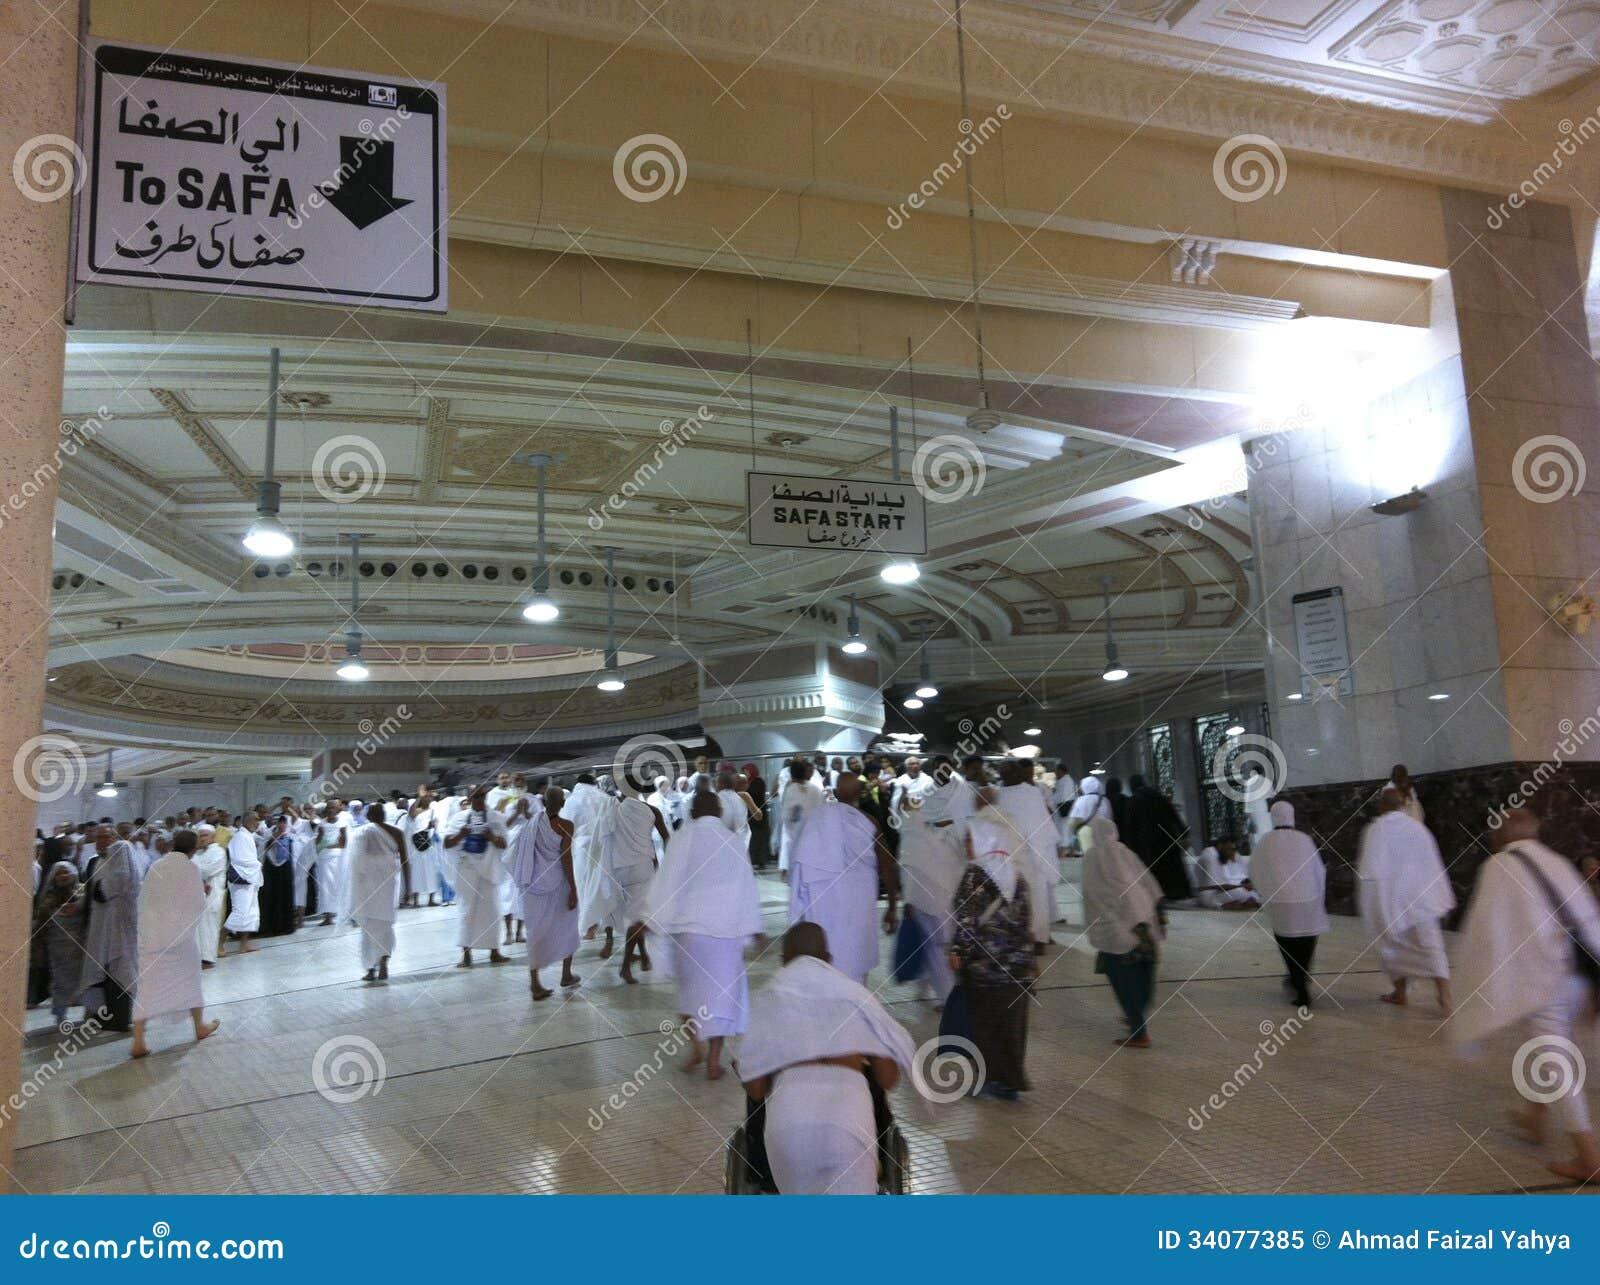 MECCA-FEB.25: Muslim pilgrims reach Safa mount from Marwah mount on ...